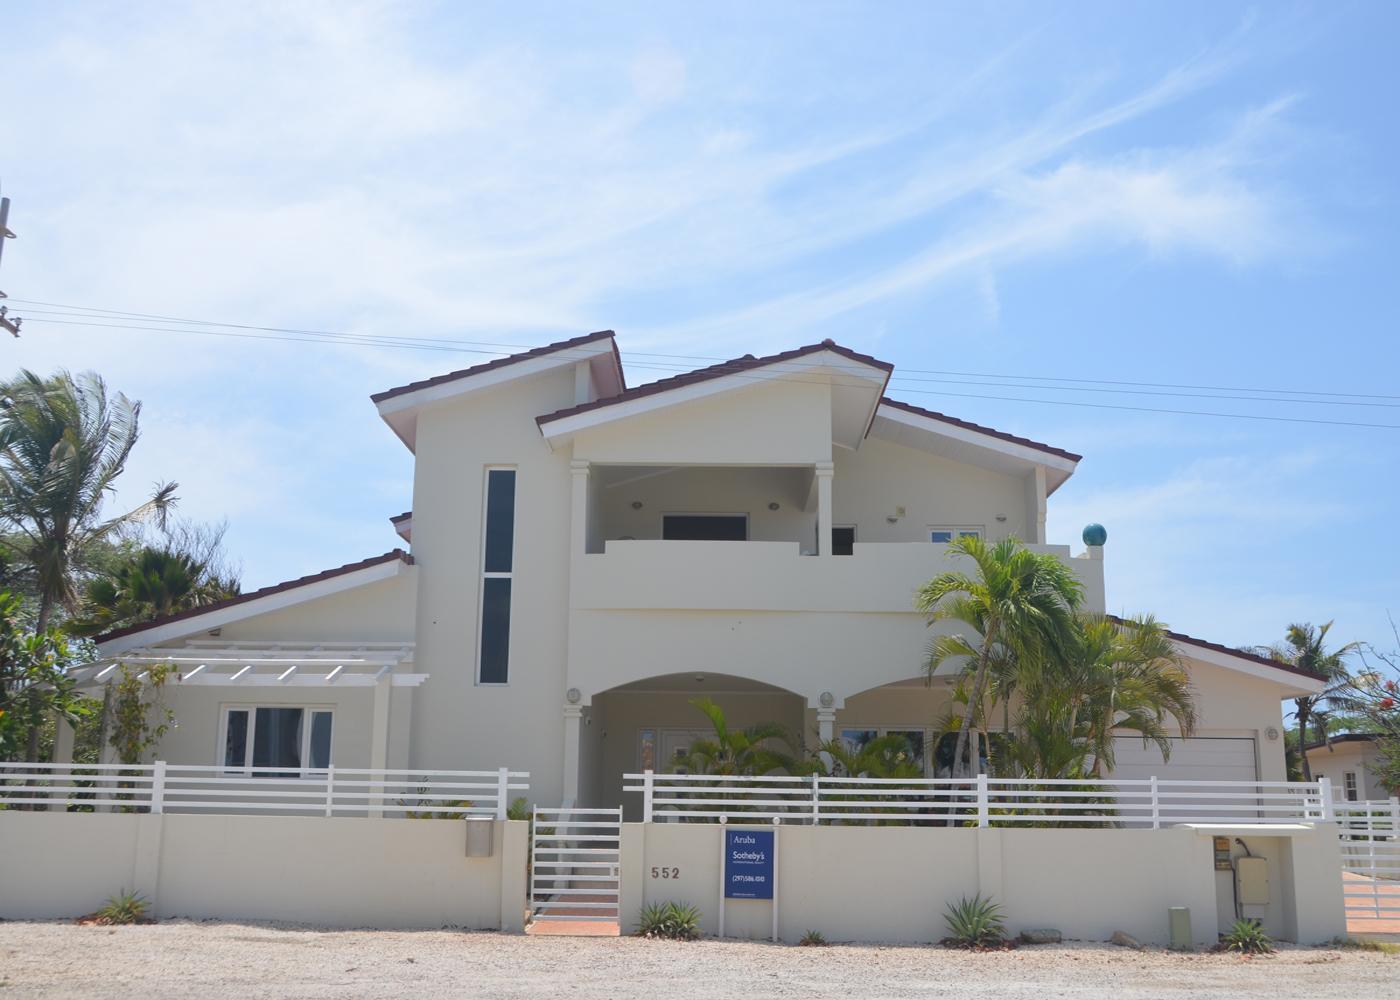 Property Of 'sGravendeel Villa